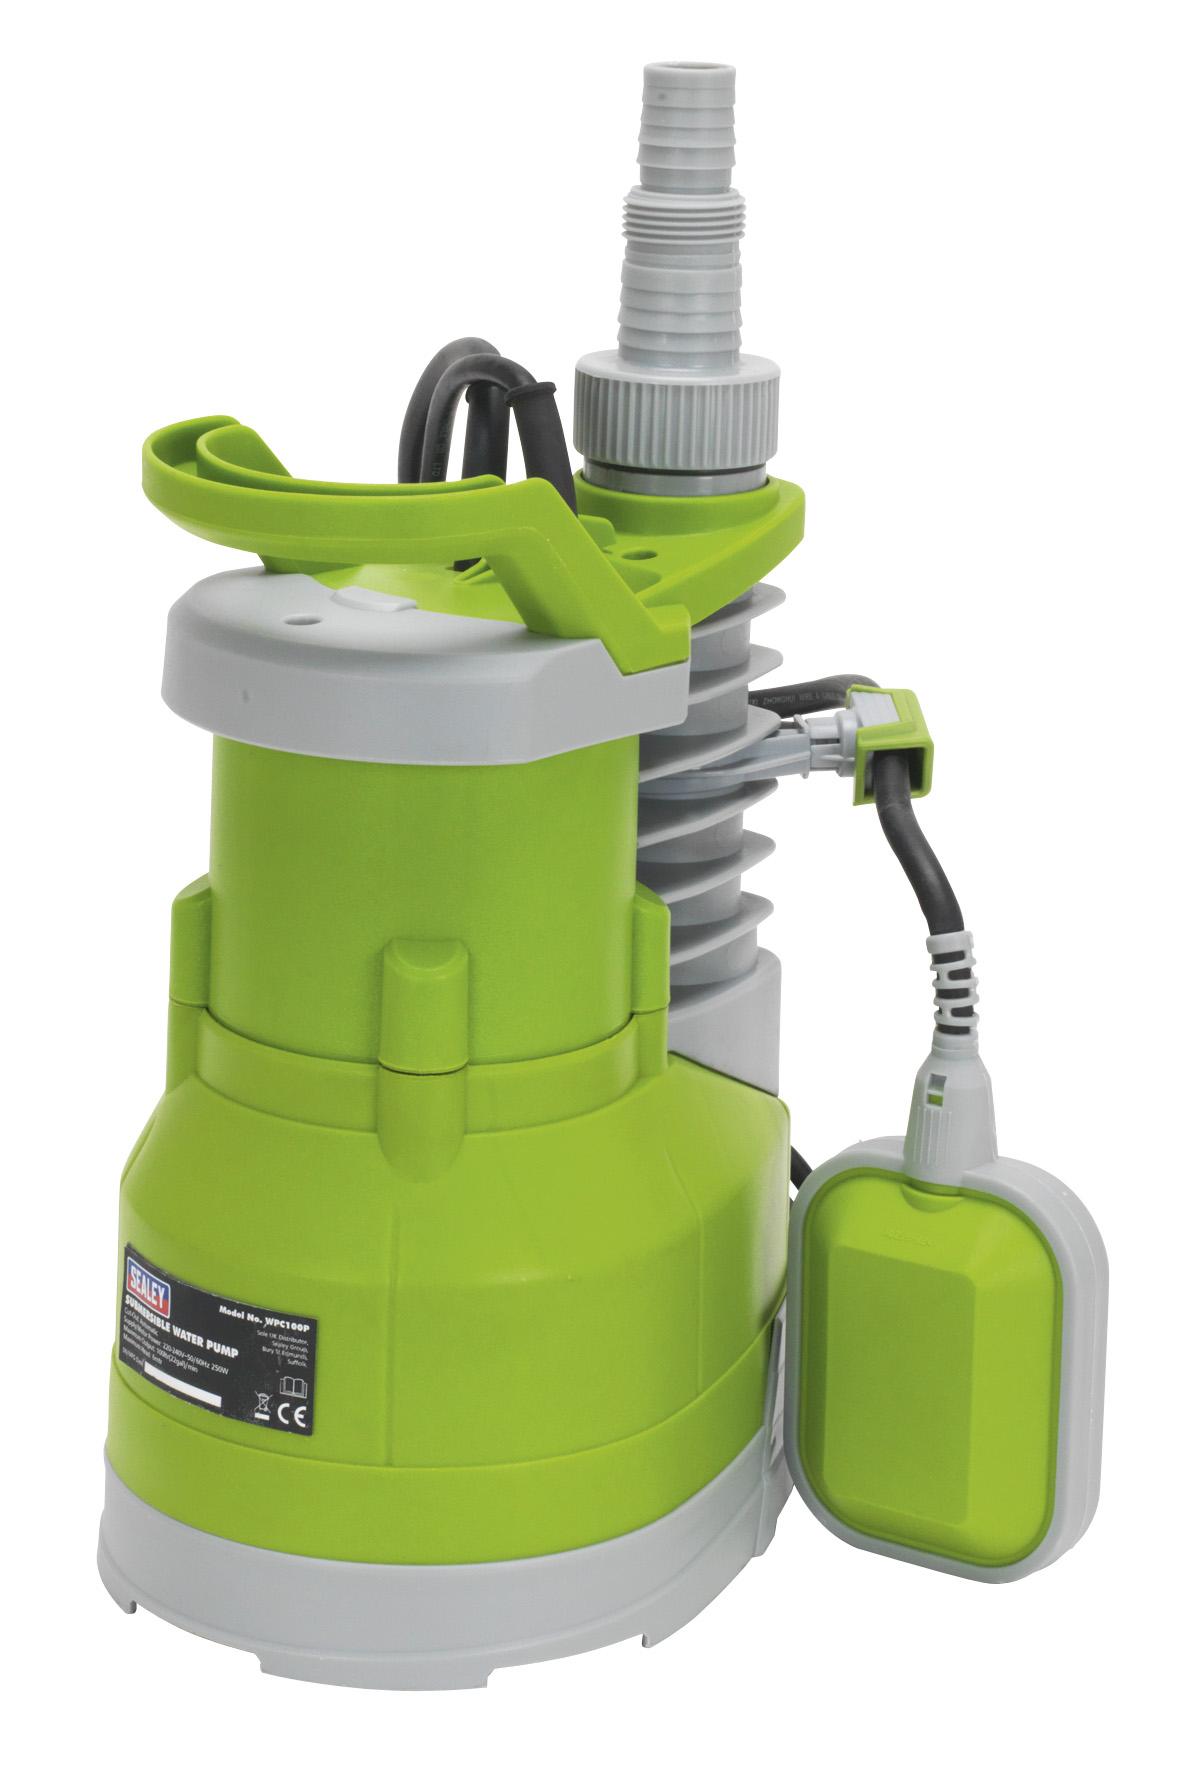 Karcher Karsp3 Sp3 Submersible Dirty Water Pump 350 Watt 240 Volt Drainage Sp 3 Dirt Sealey Wpc100p Automatic 100ltr Min 230v